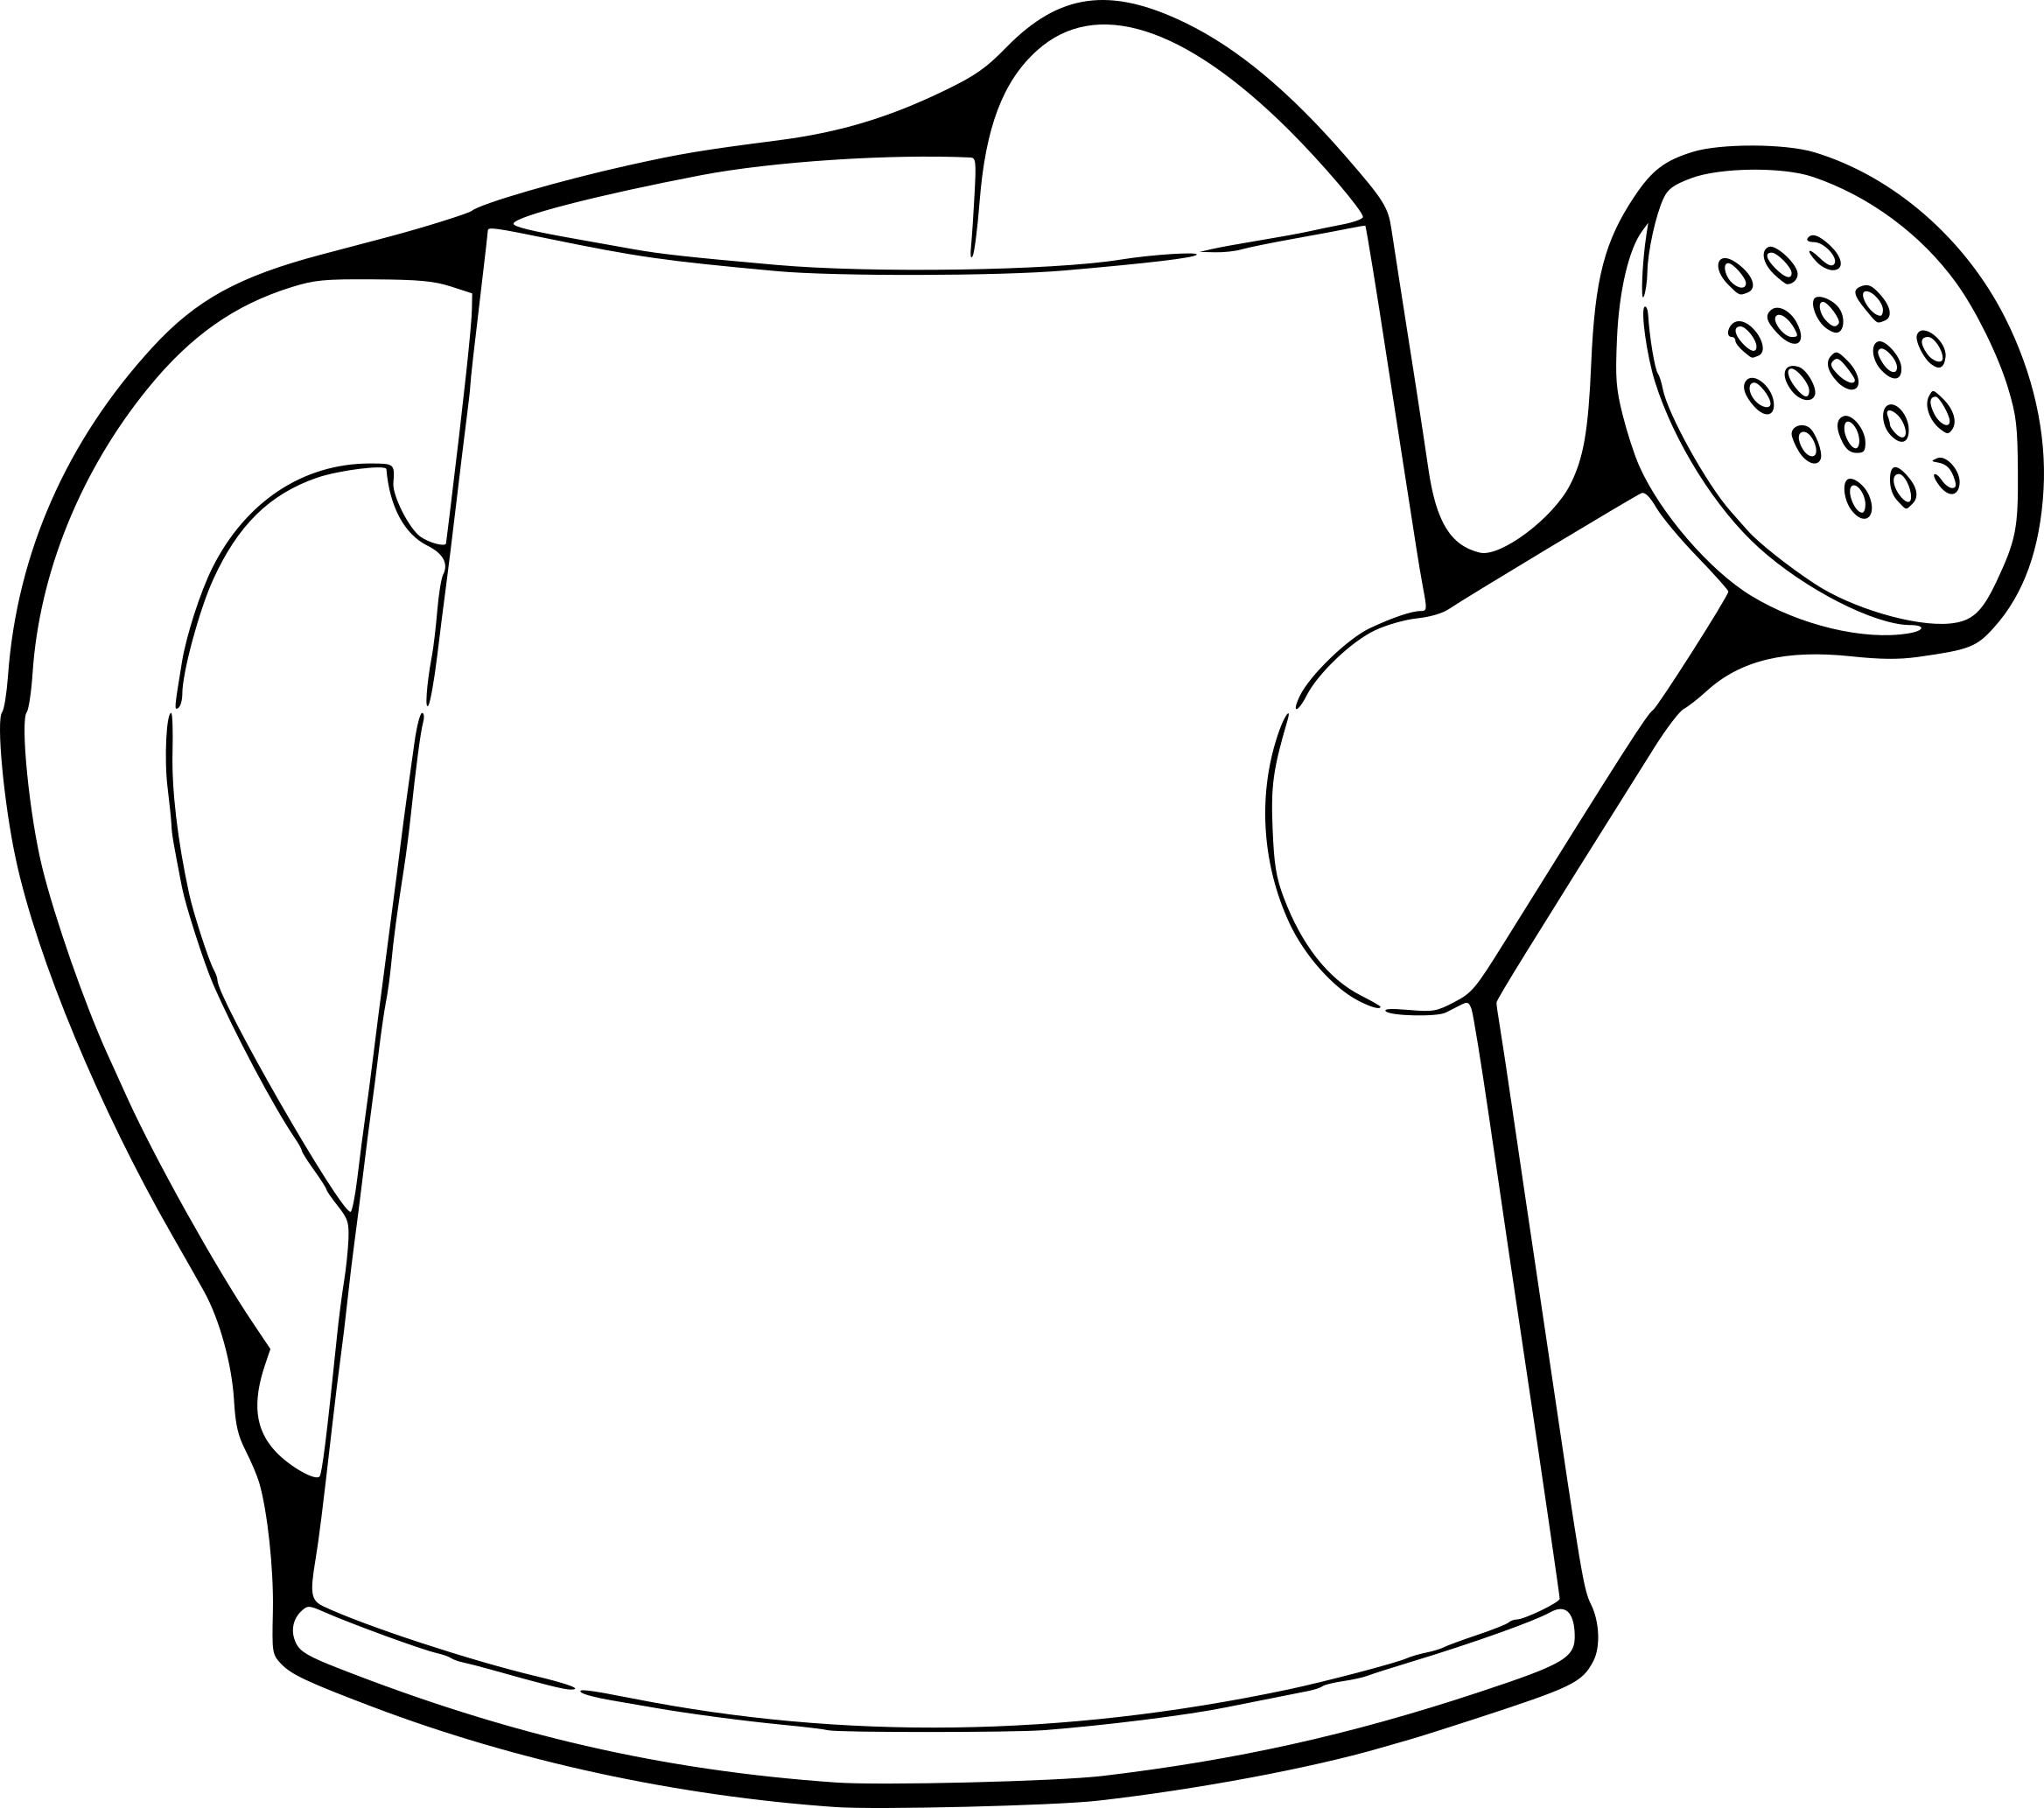 Arrosoir dessin